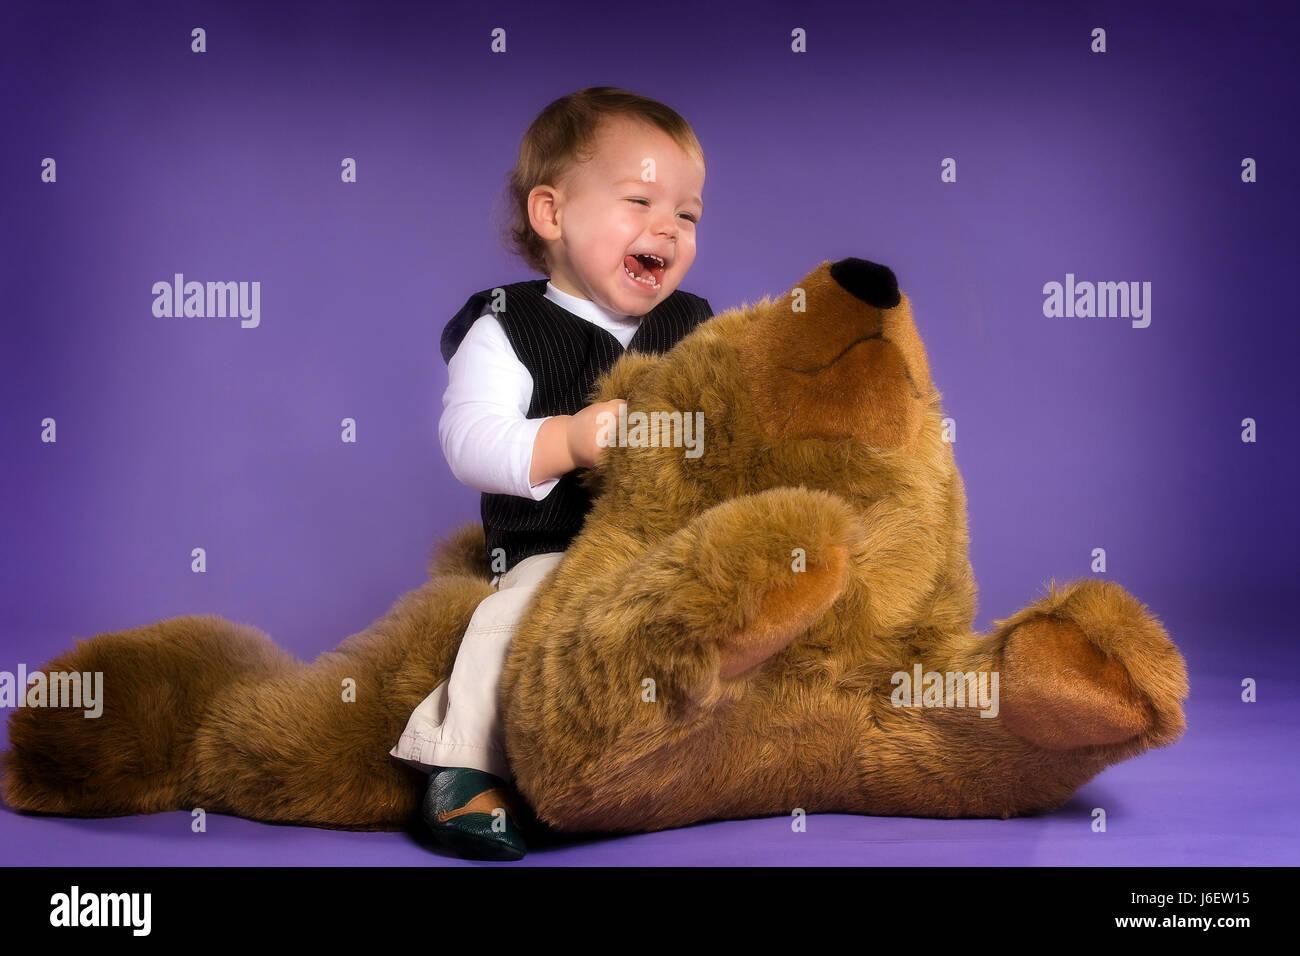 toddler riding on giant teddy Stock Photo